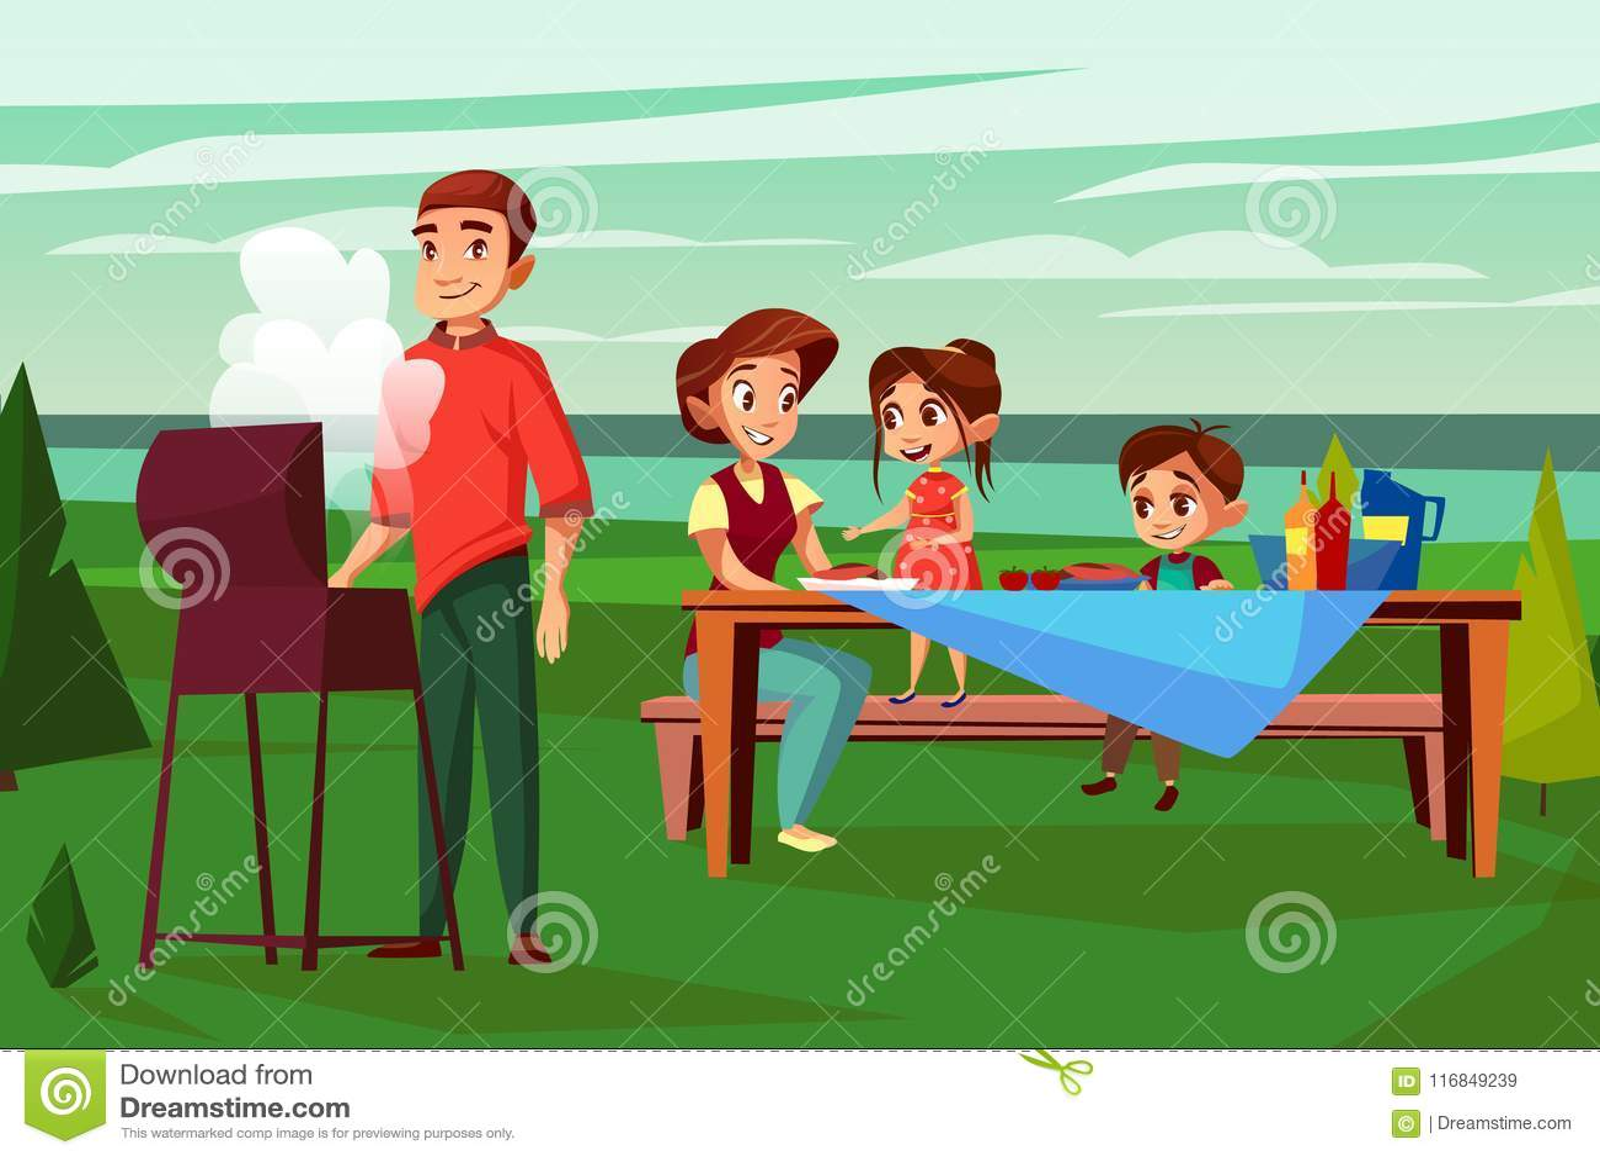 Family barbecue picnic vector cartoon illustration